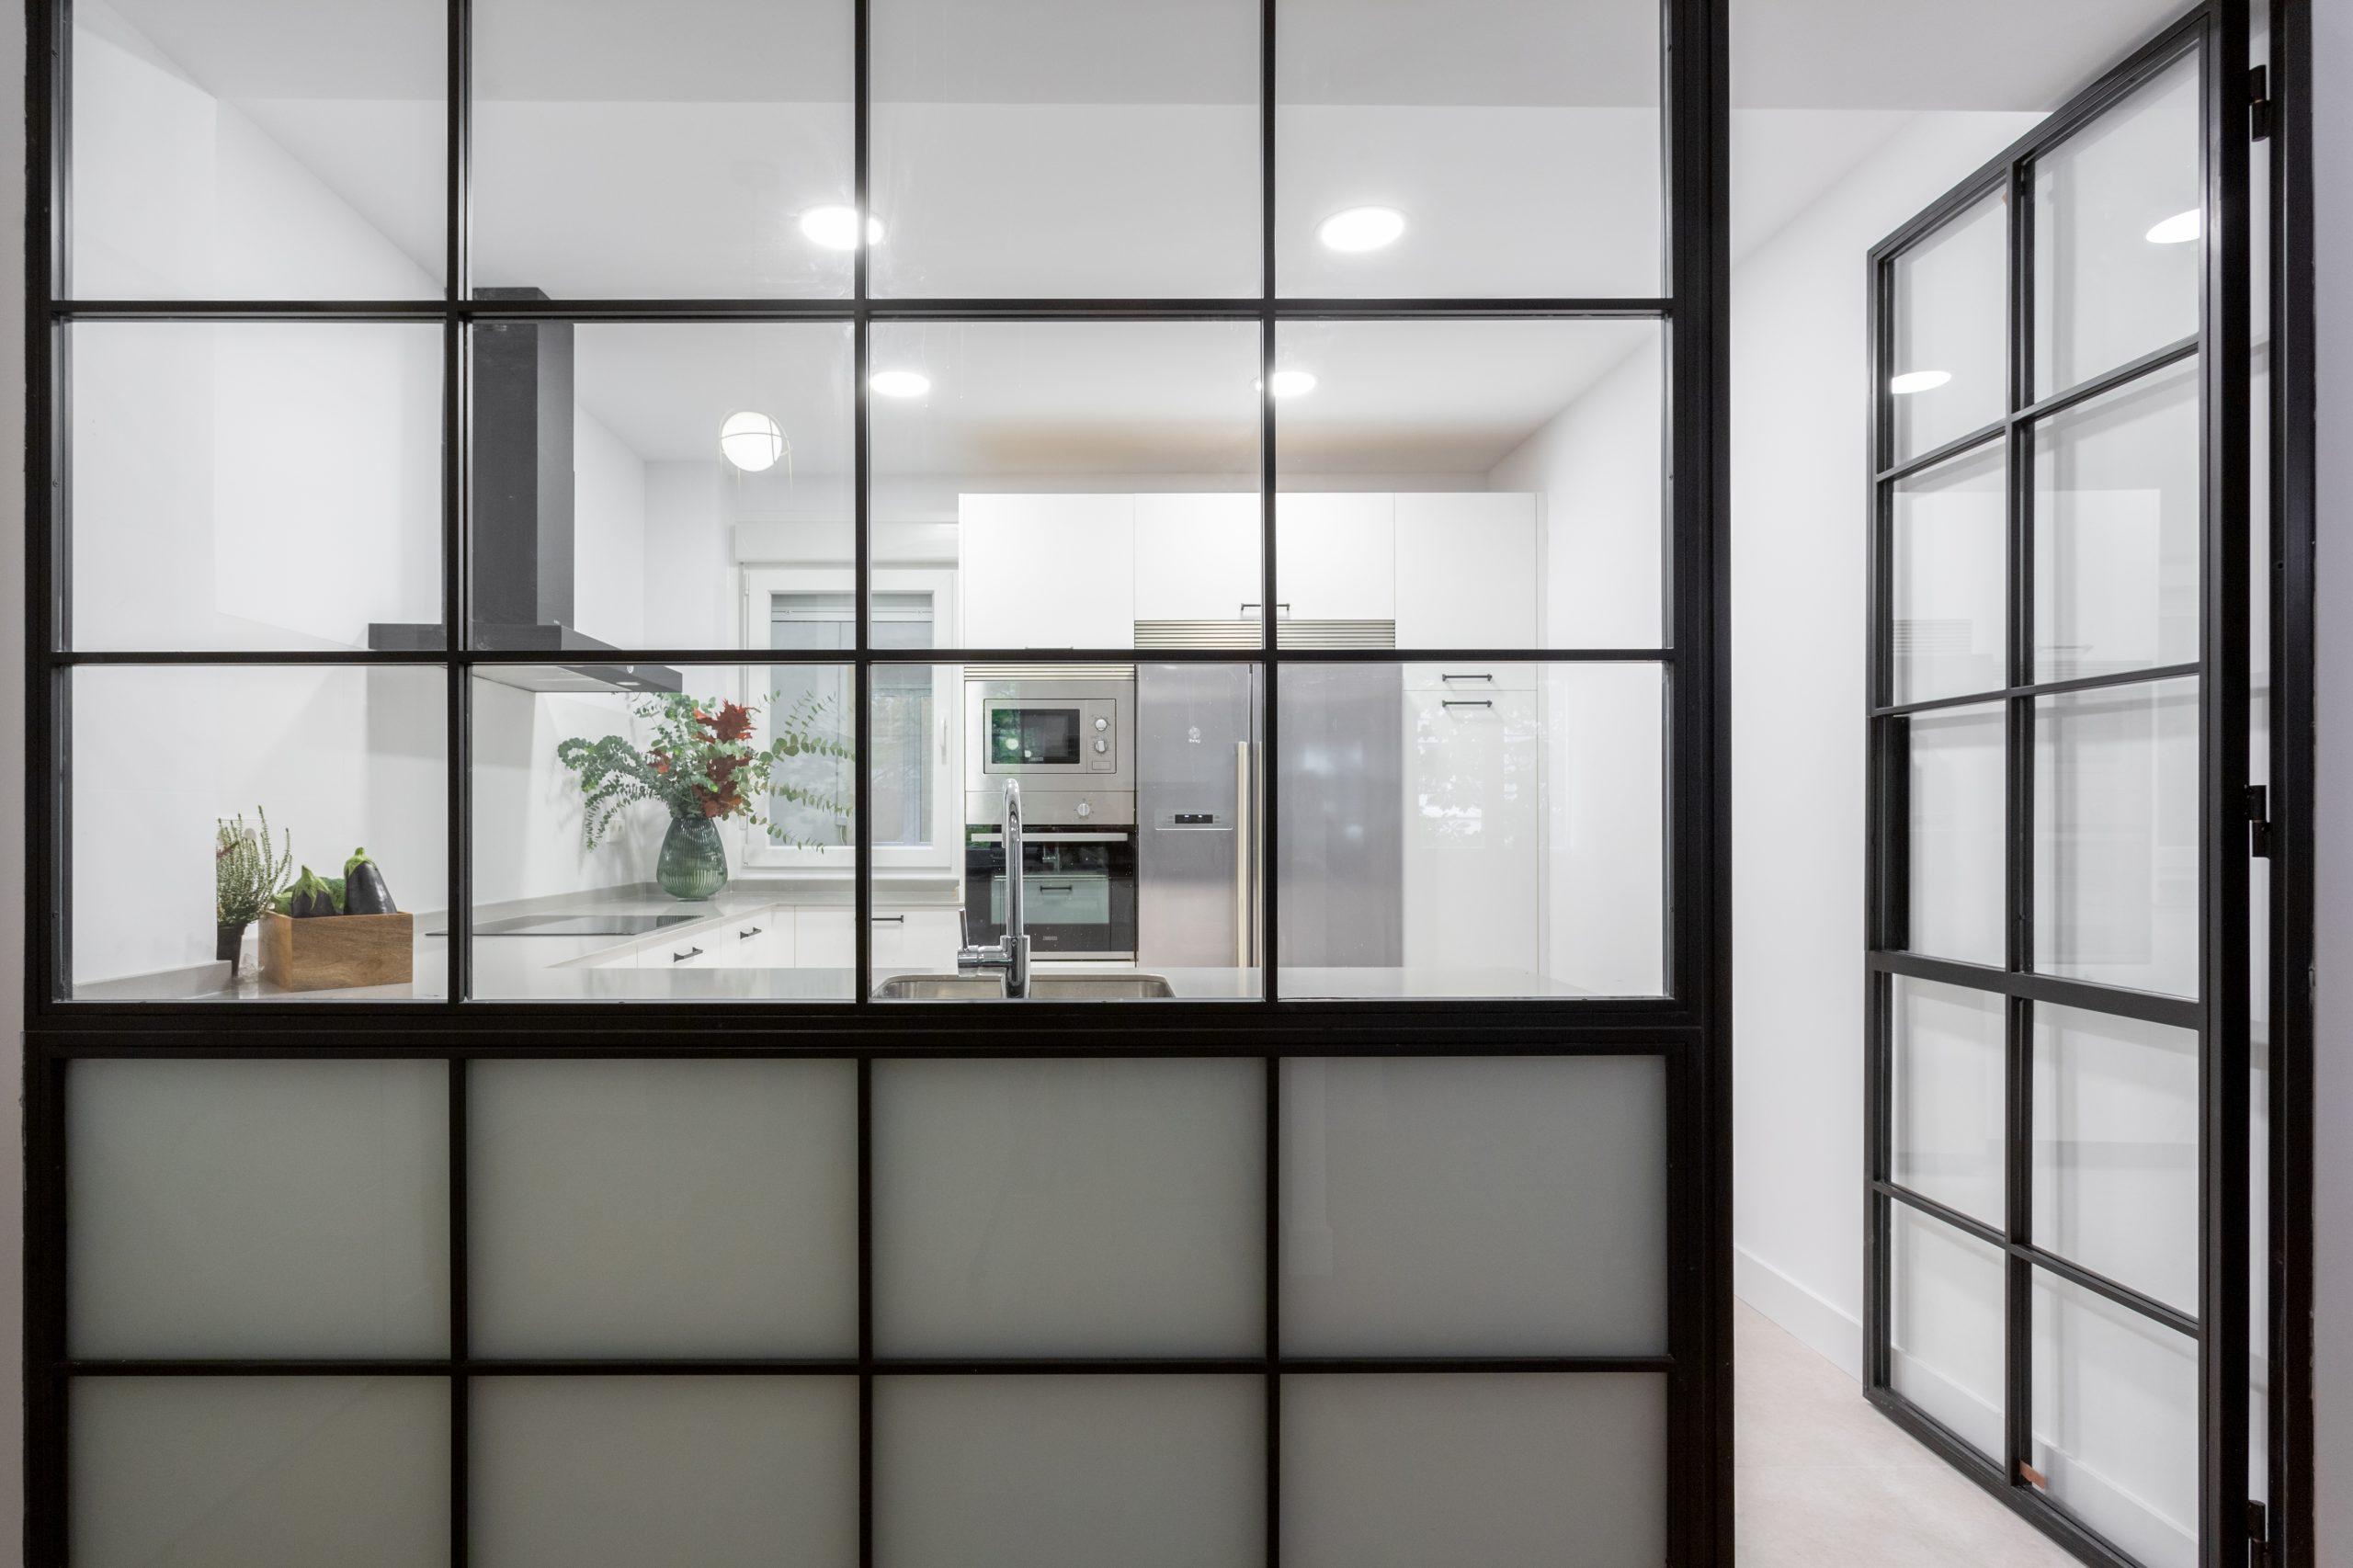 Proyectos de arquitectura, diseño, reformas